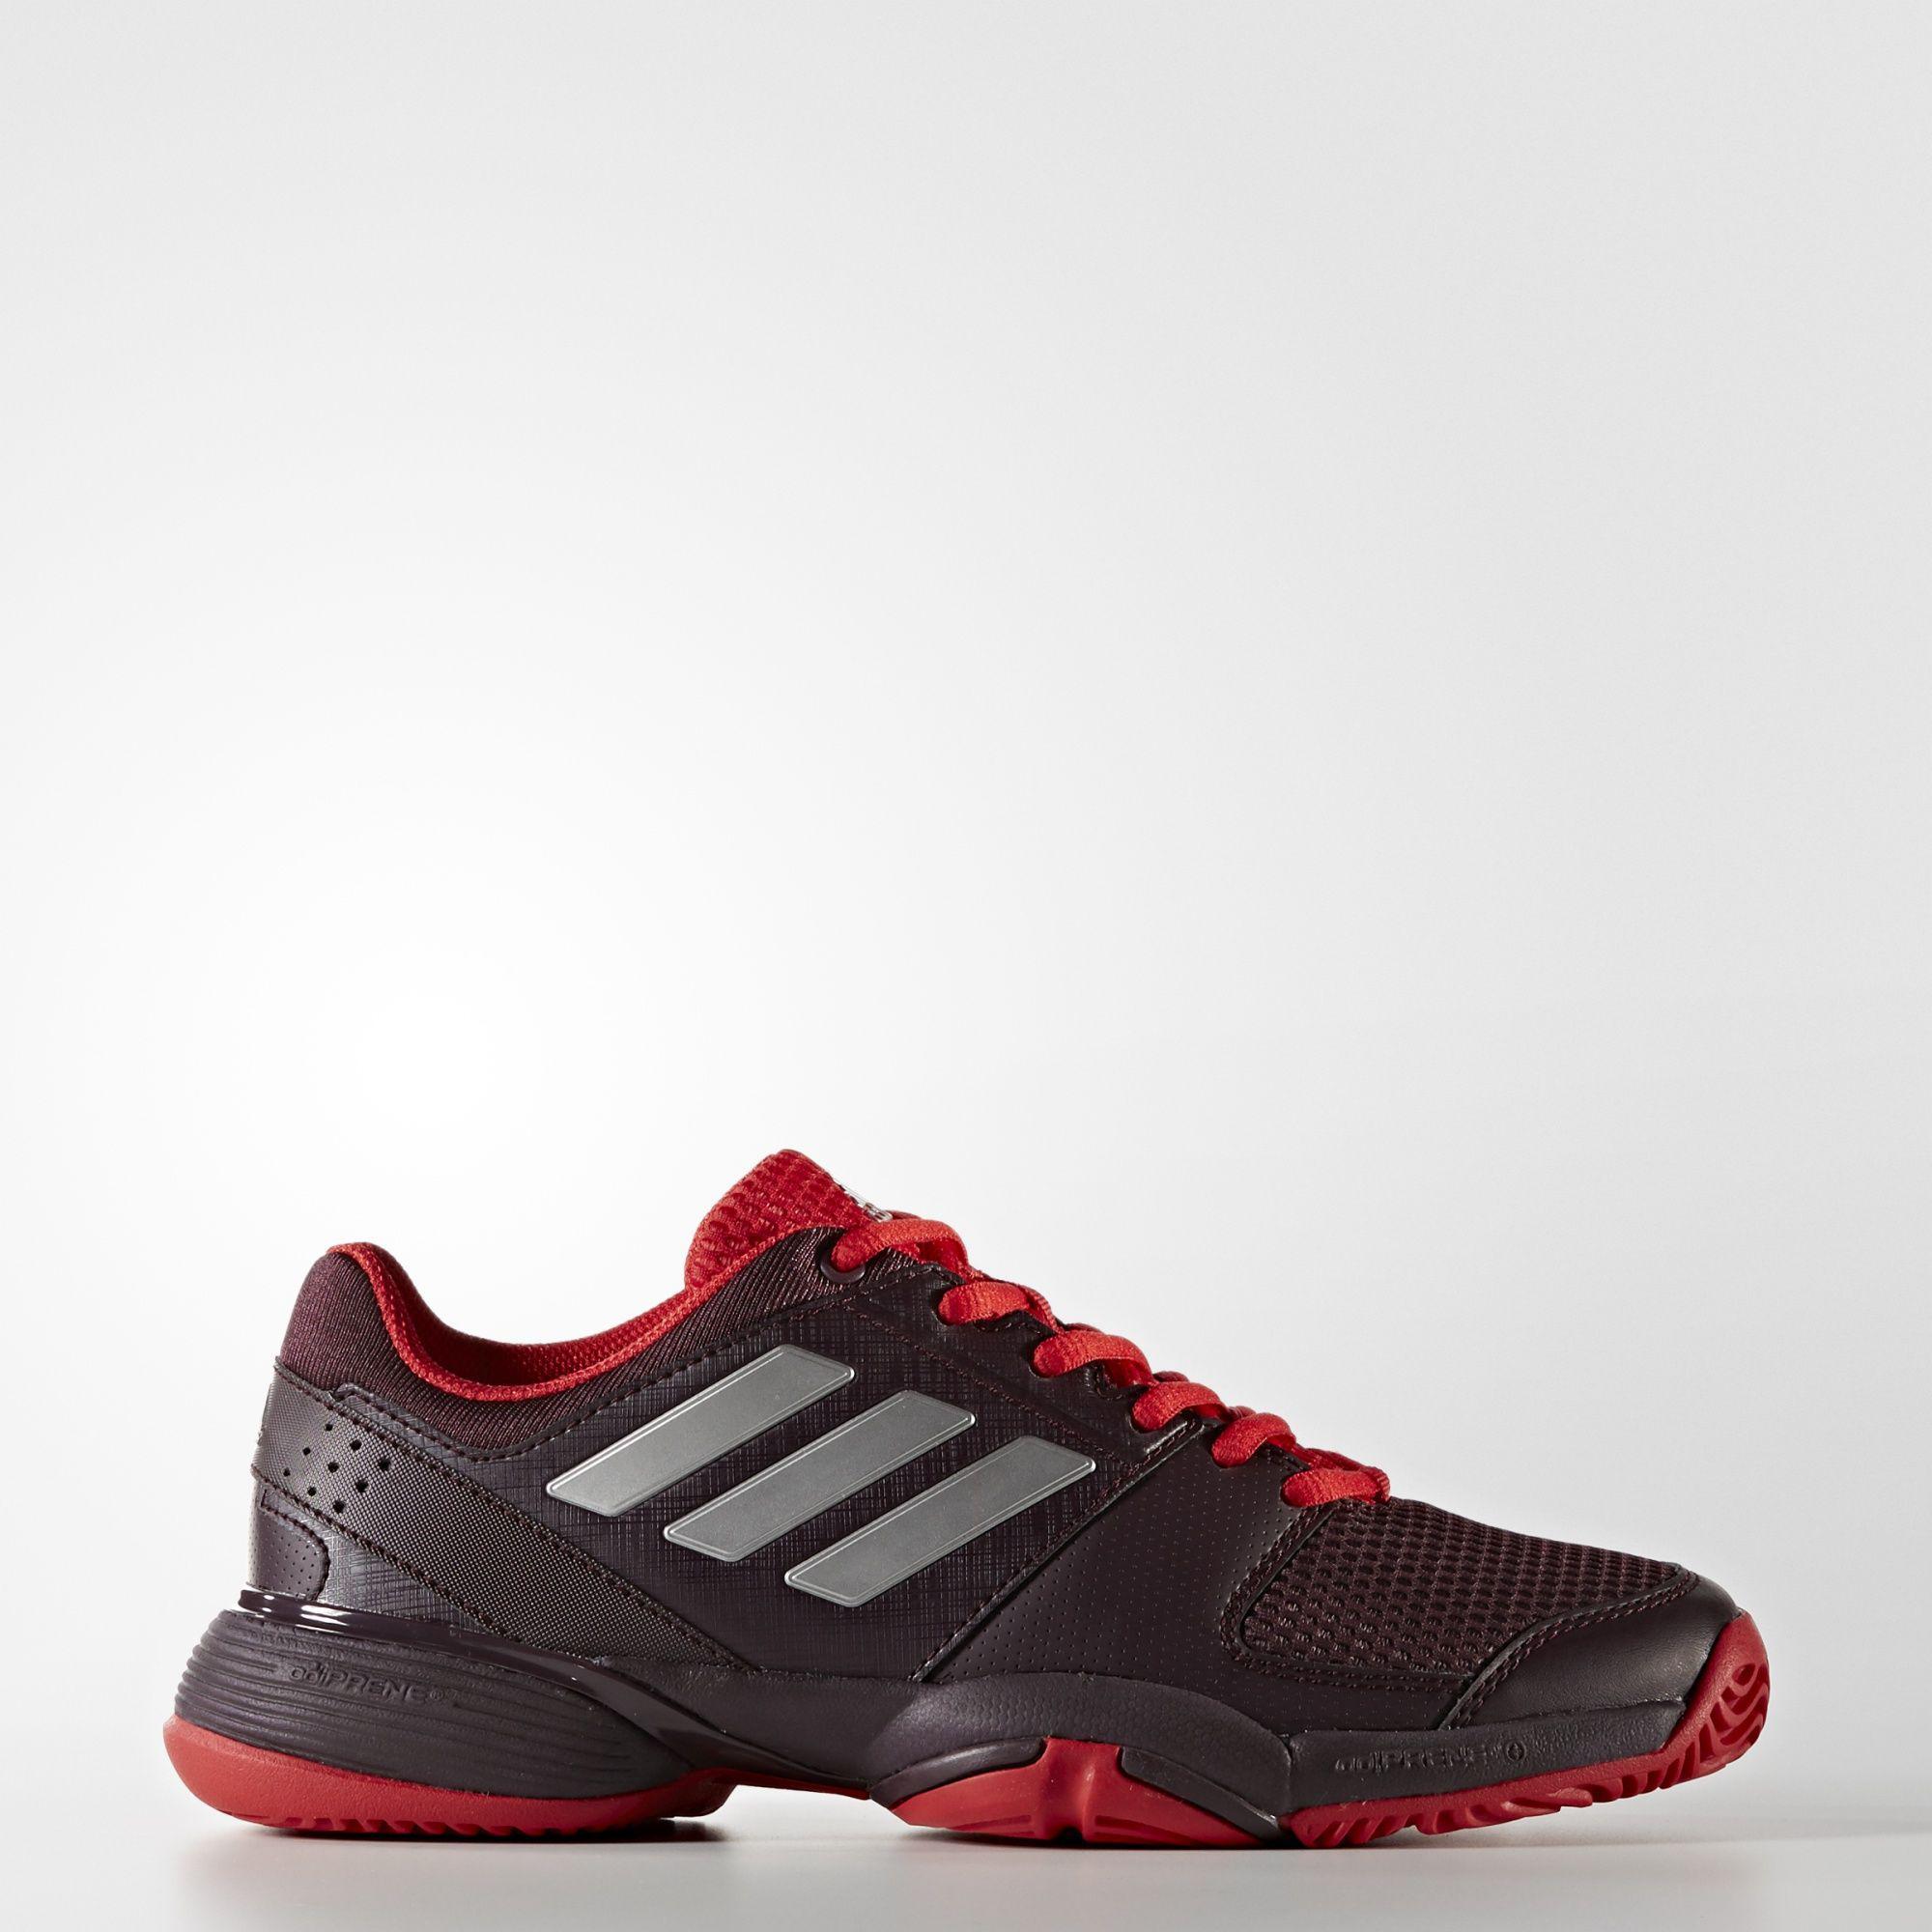 6c0d5ebe5 Adidas Kids Barricade Club XJ Tennis Shoes - Burgundy Scarlet -  Tennisnuts.com